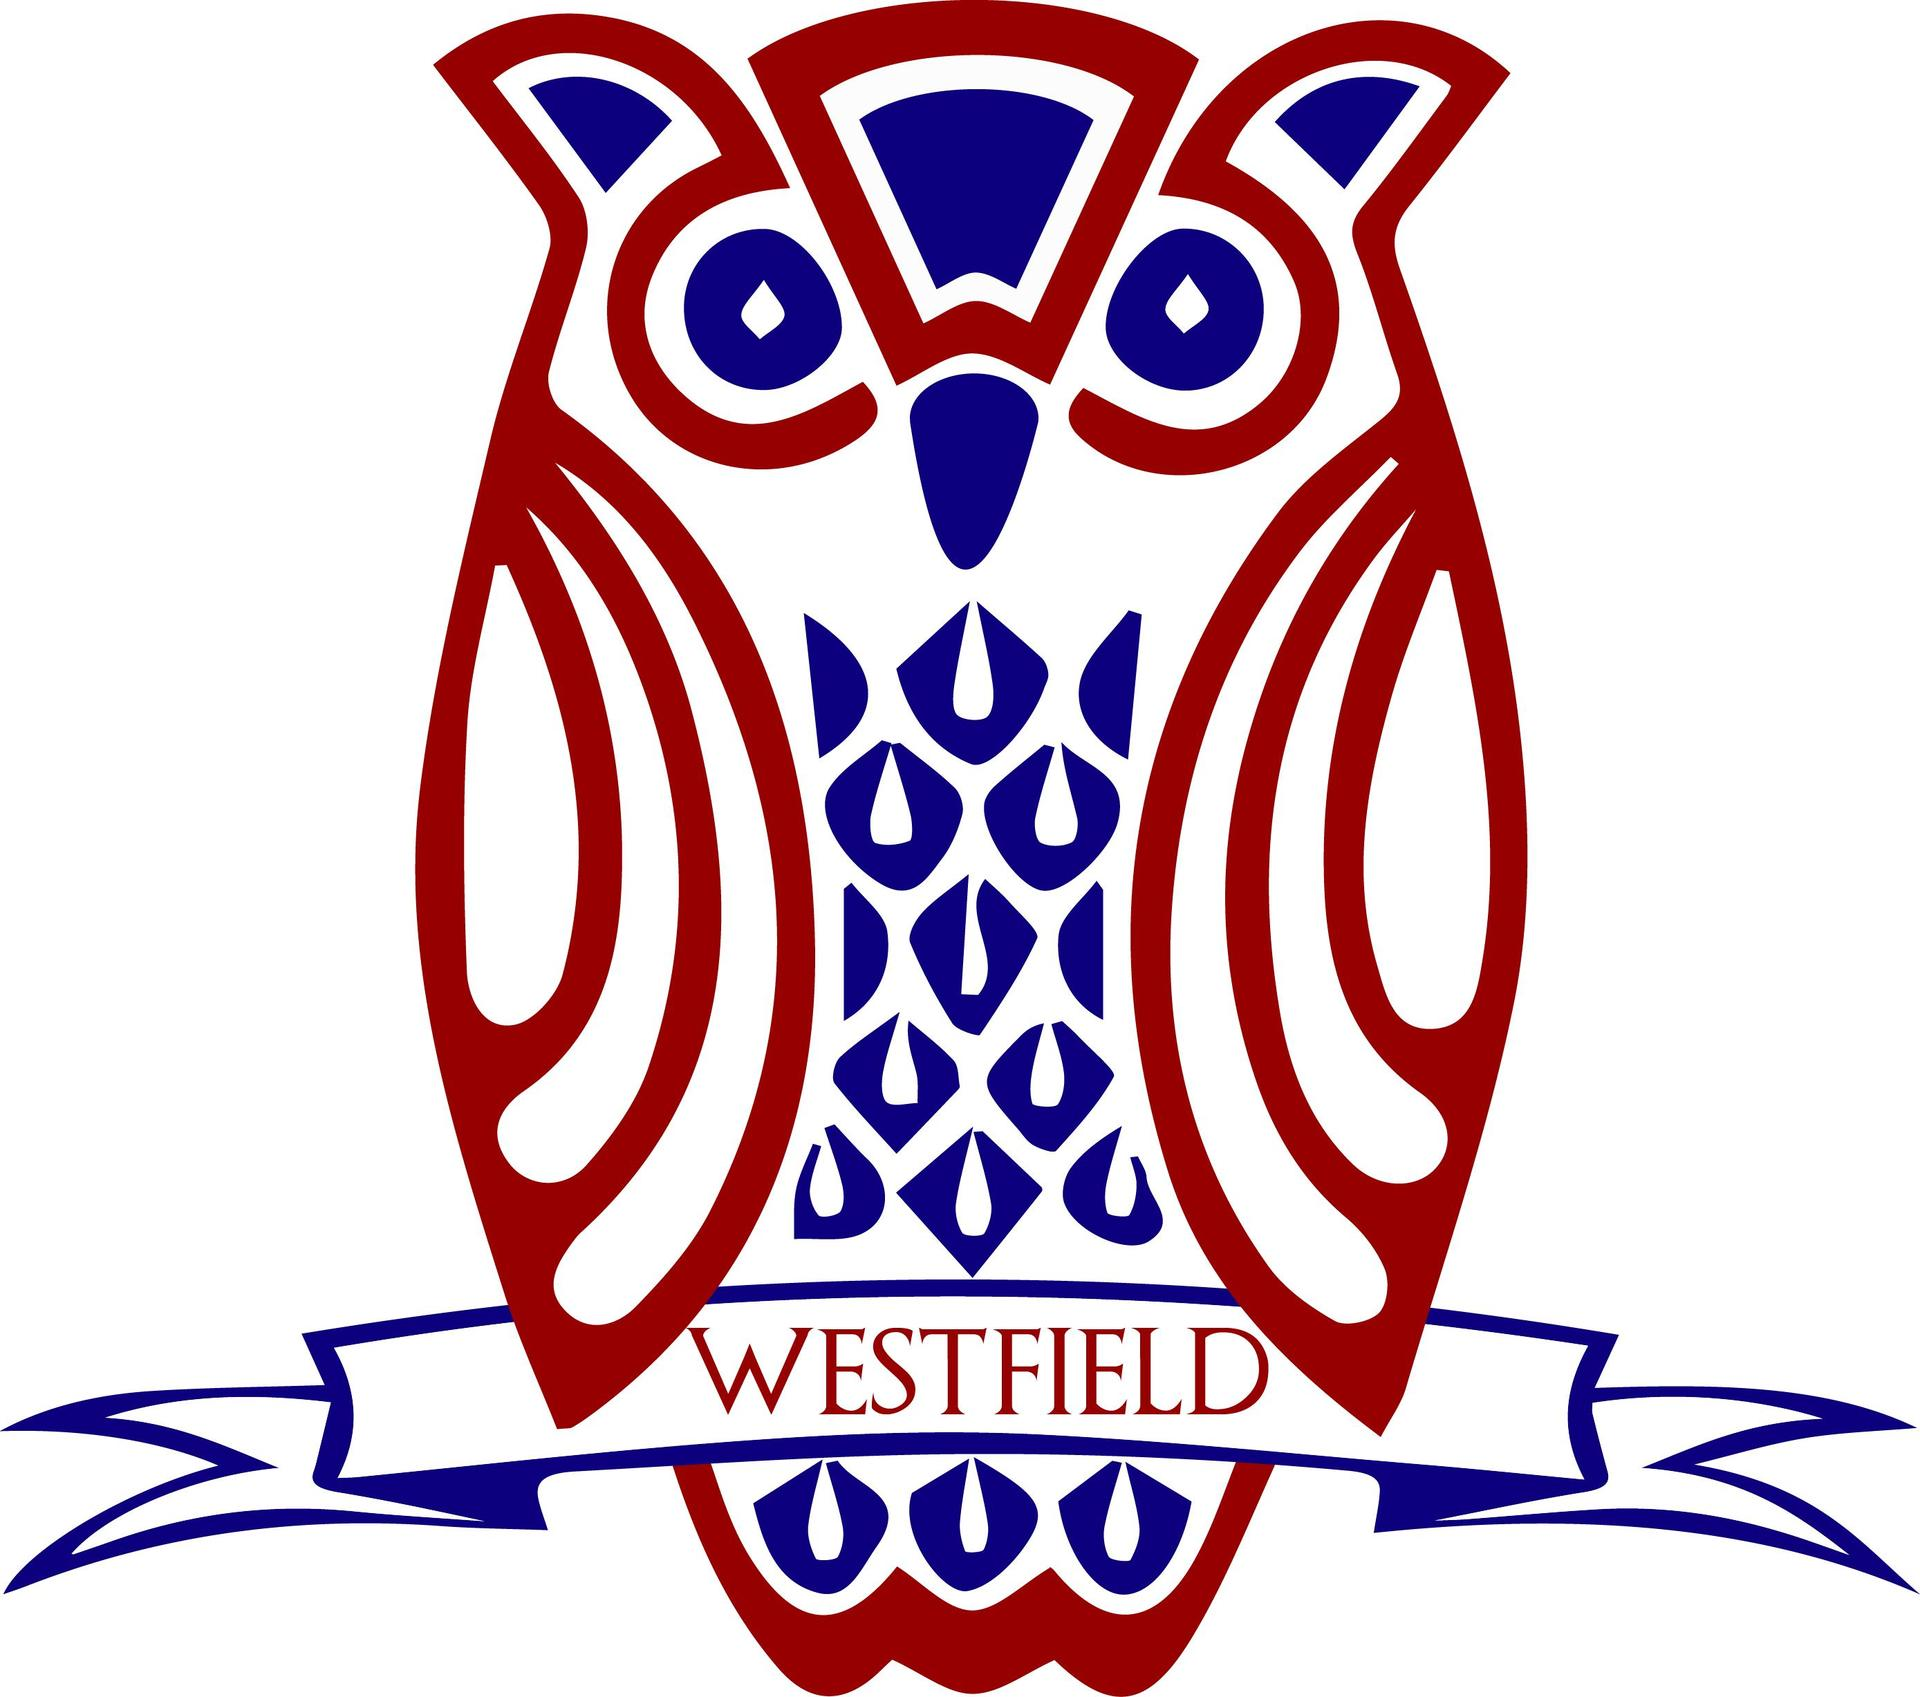 Garnet and Blue Owl Logo for Westfield Friends School